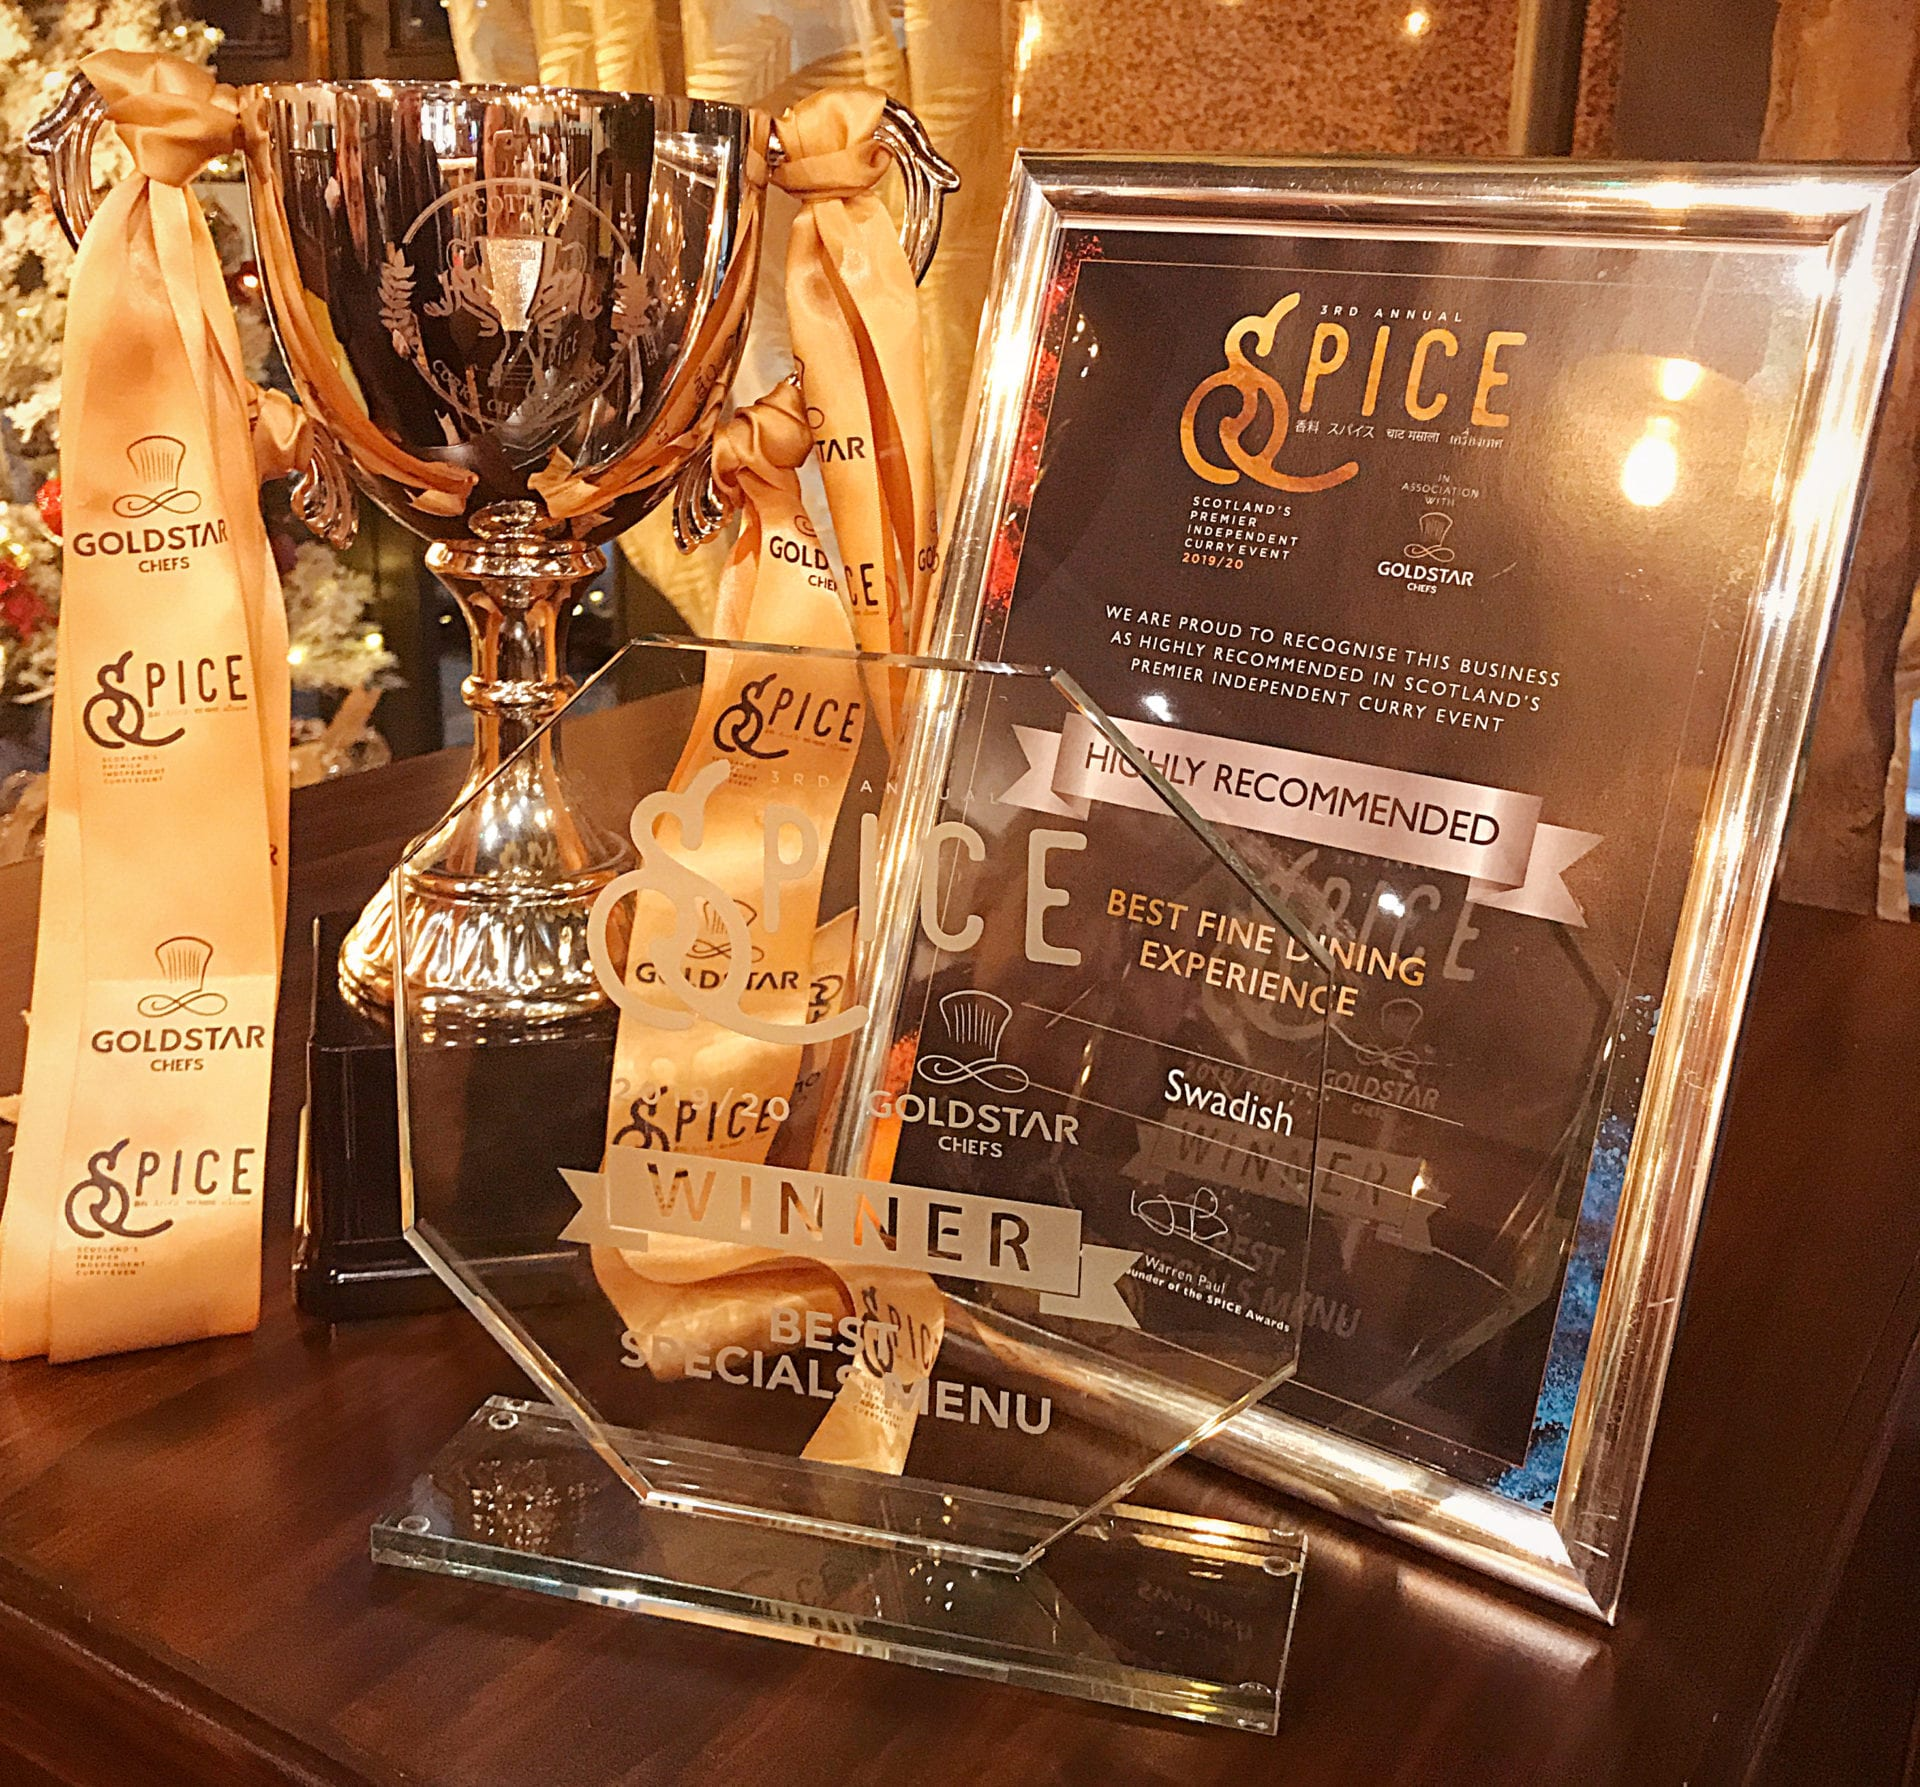 Swadish spice awards Glasgow